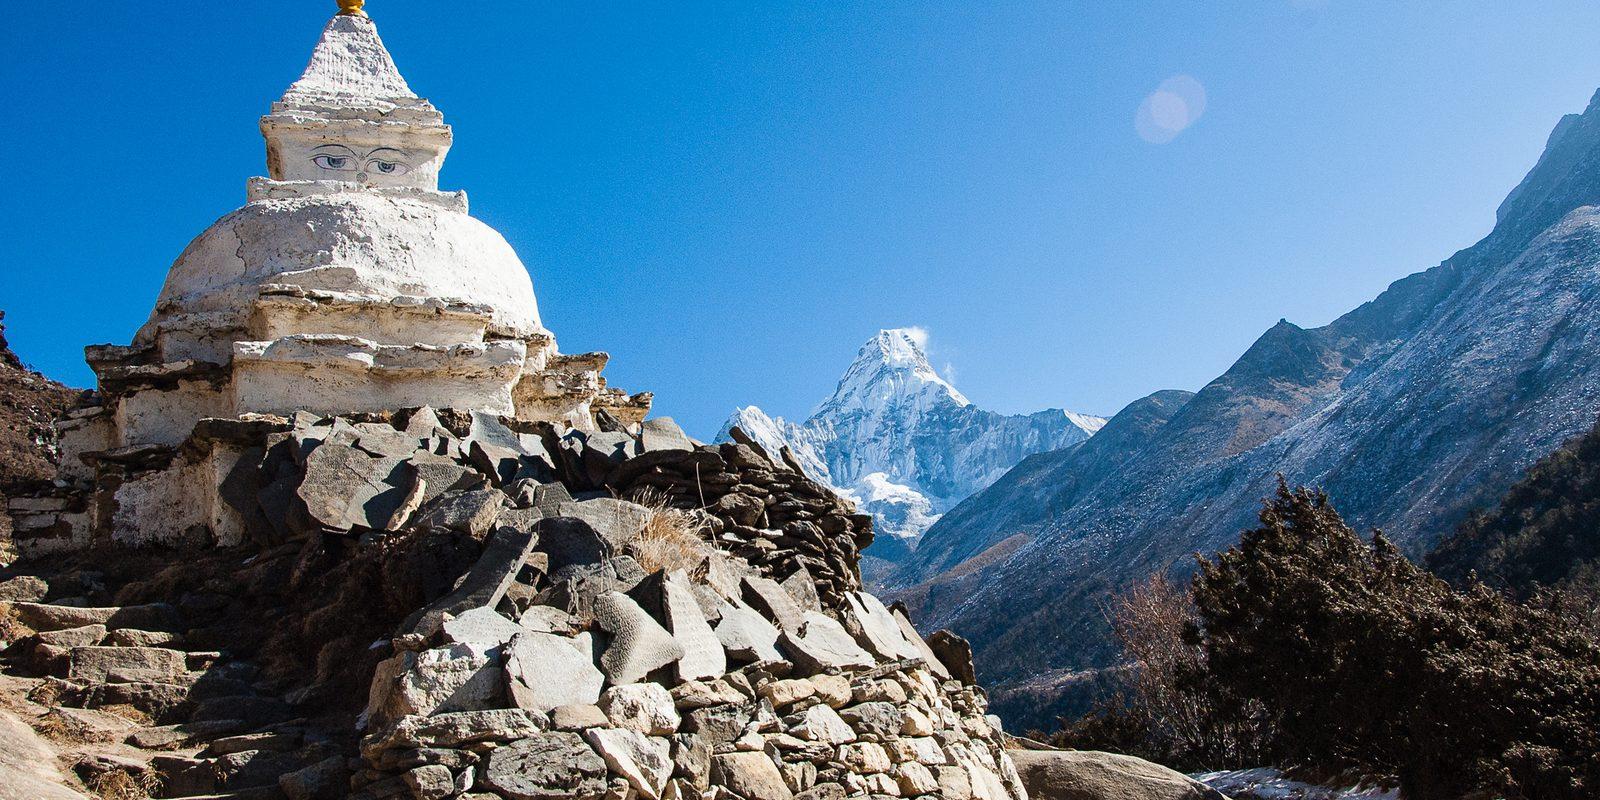 EVEREST - world's tallest peak